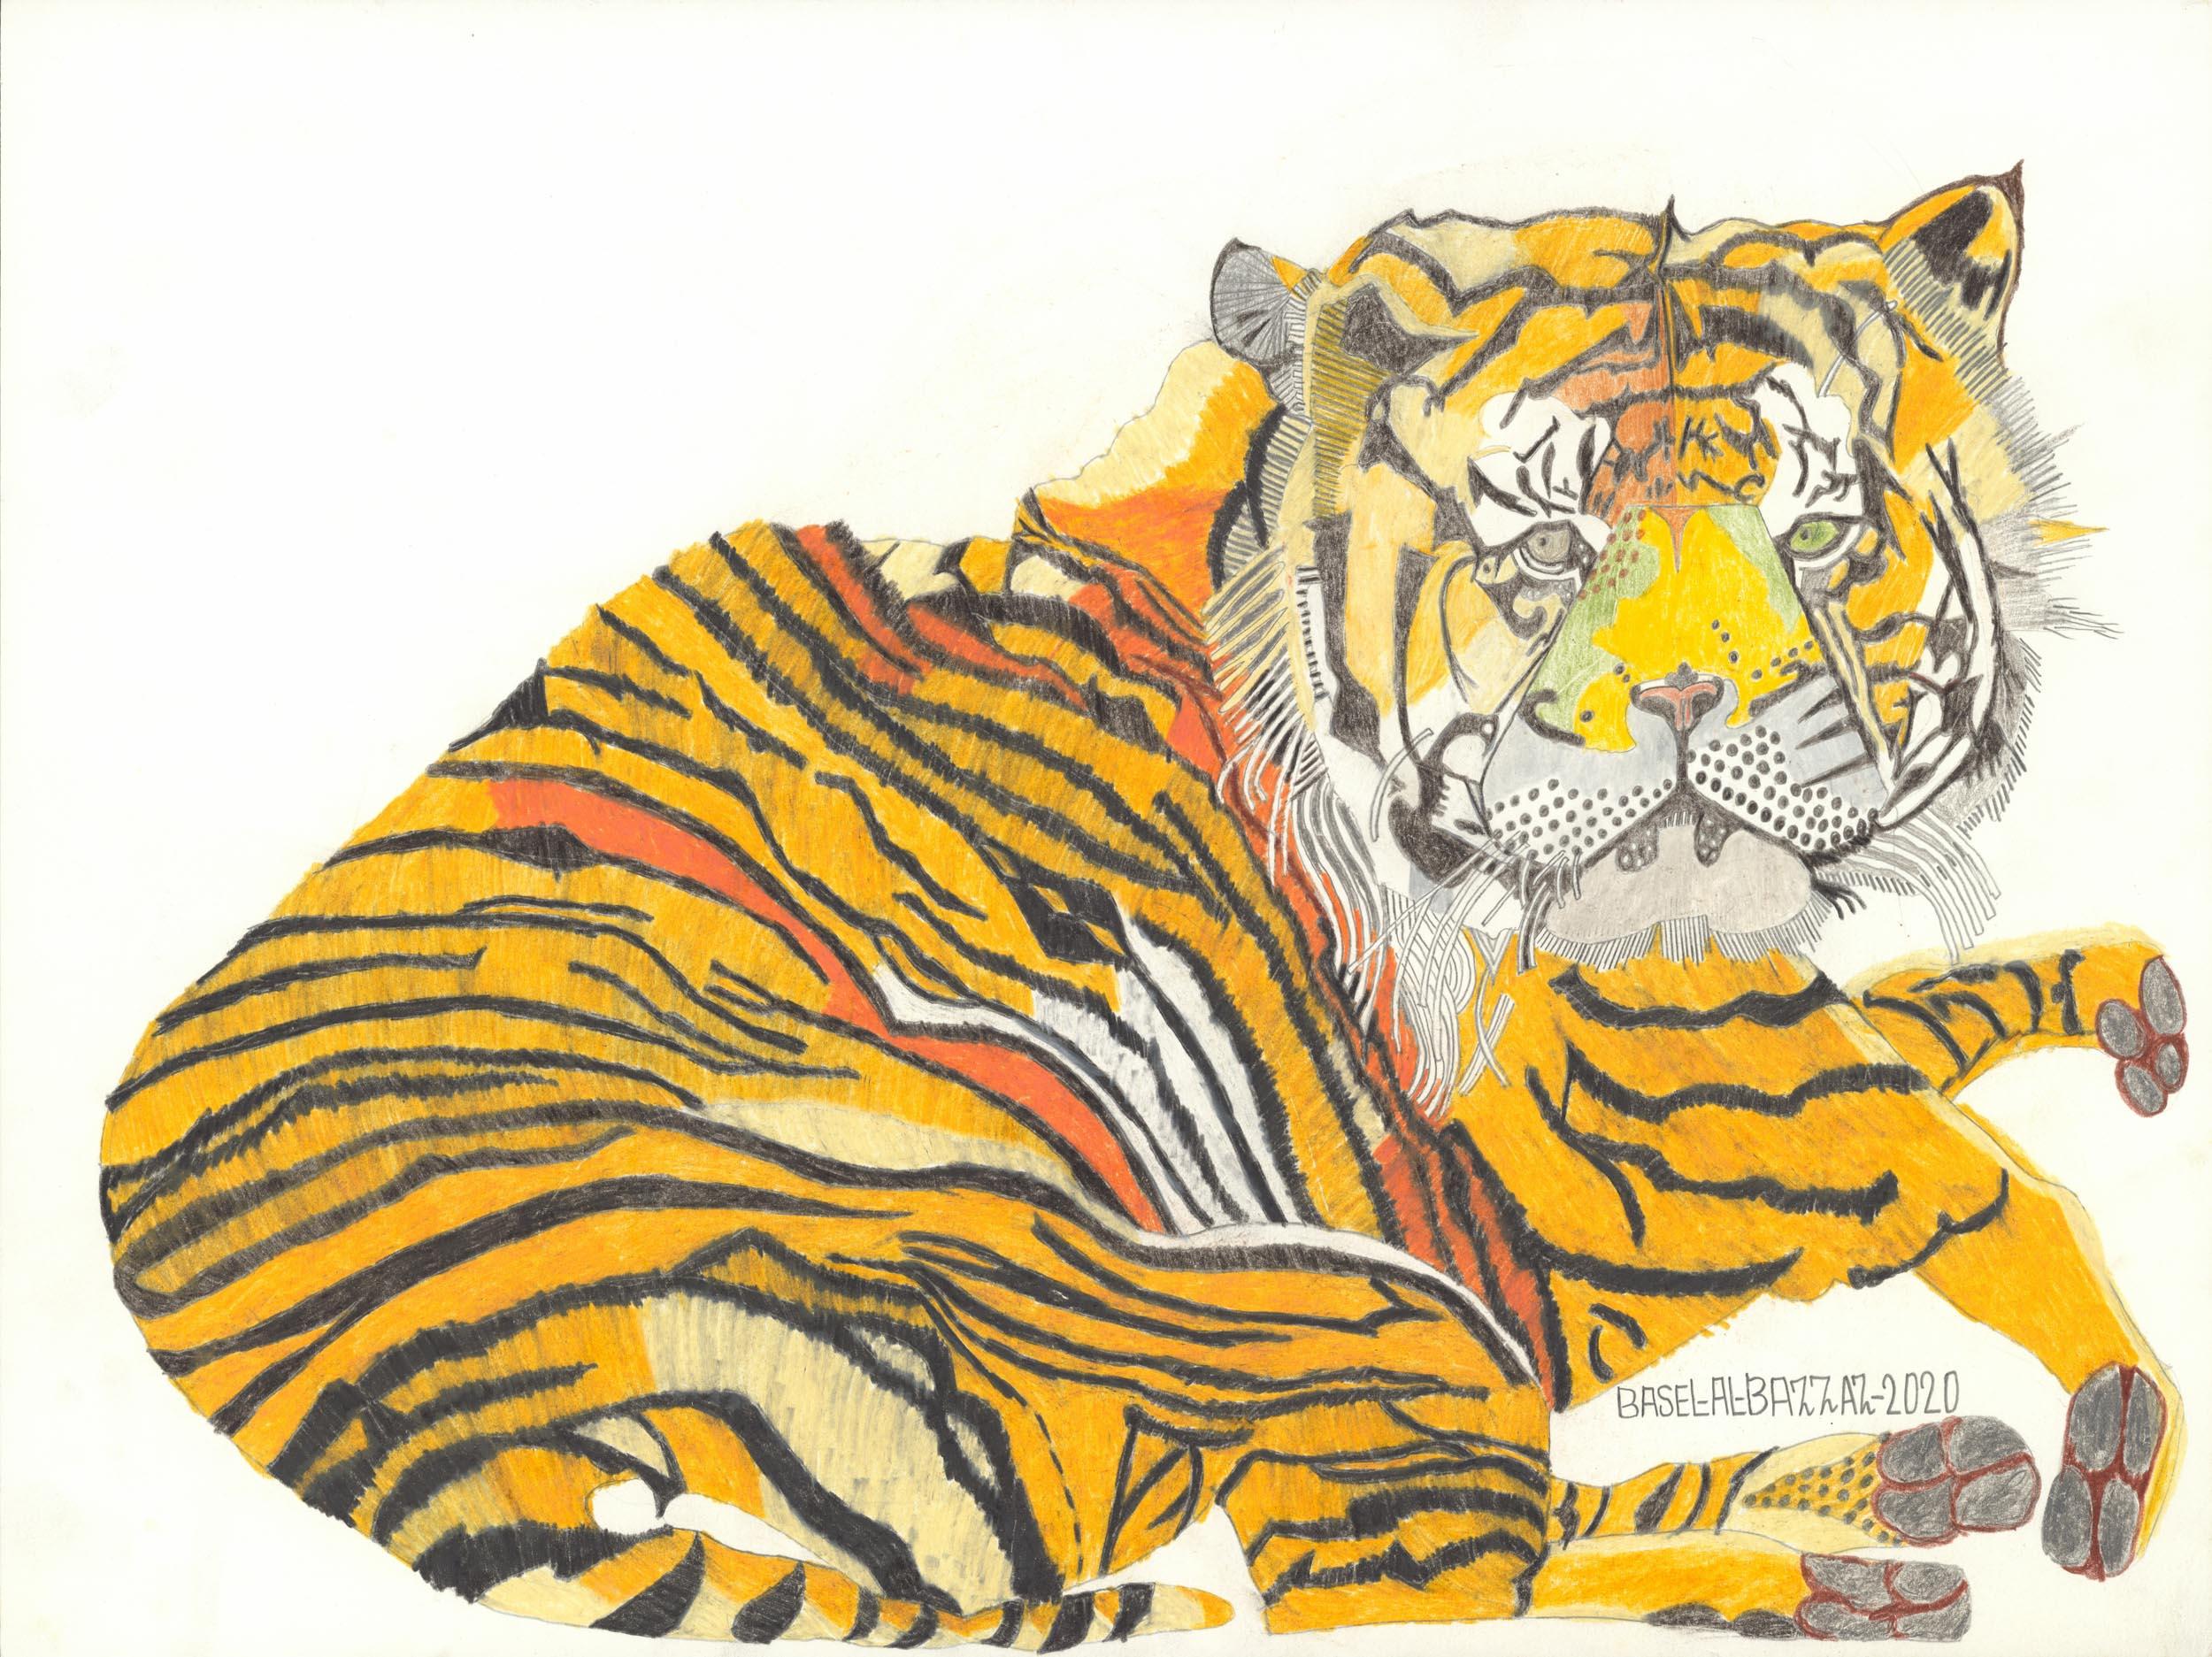 al-bazzaz basel - großer tiger/big tiger